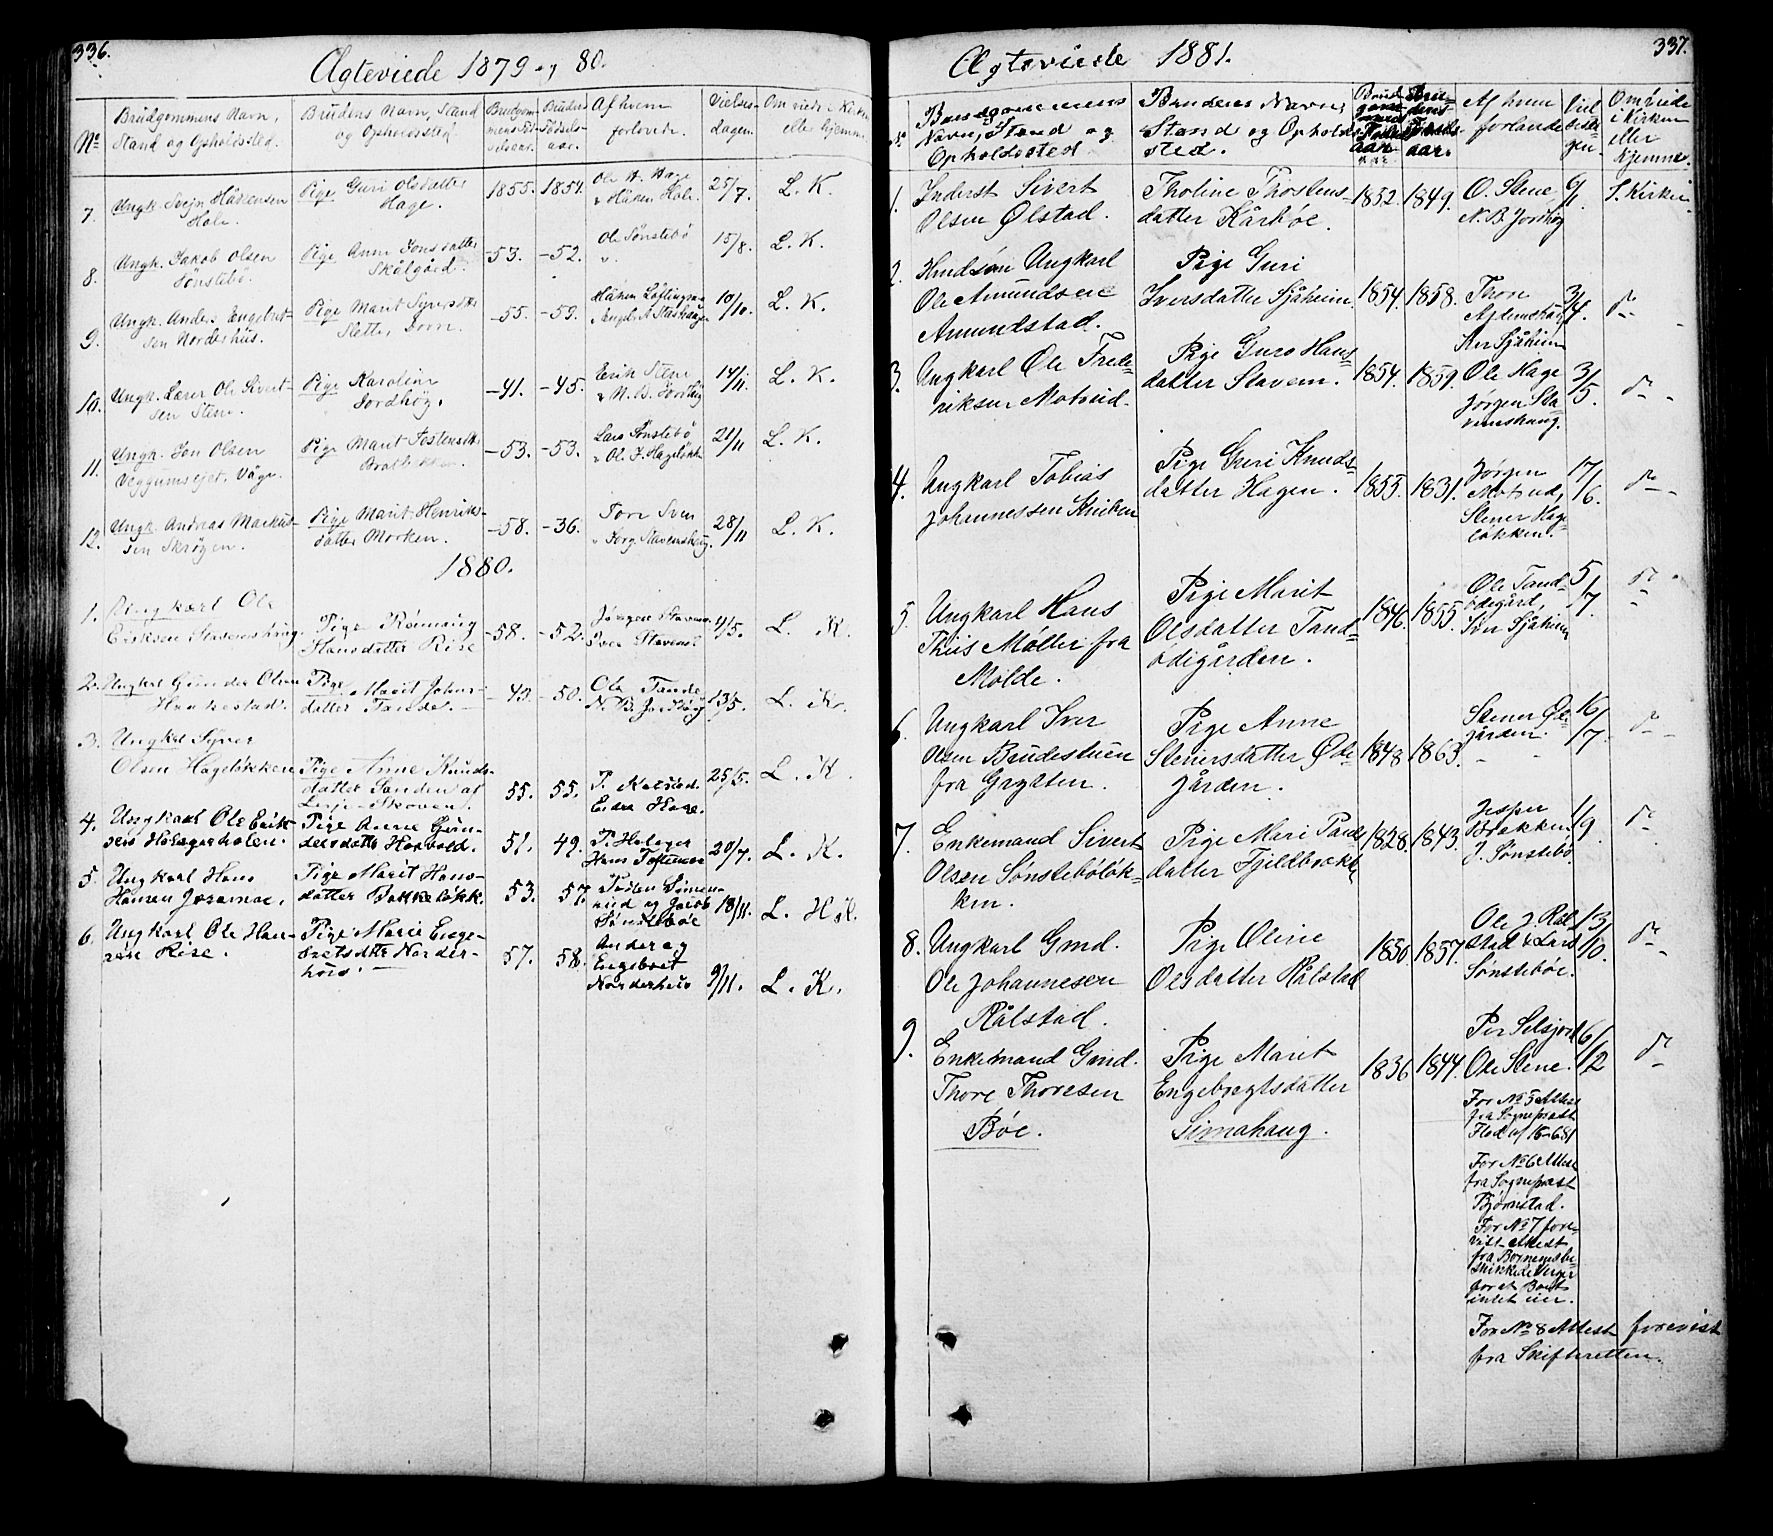 SAH, Lesja prestekontor, Klokkerbok nr. 5, 1850-1894, s. 336-337